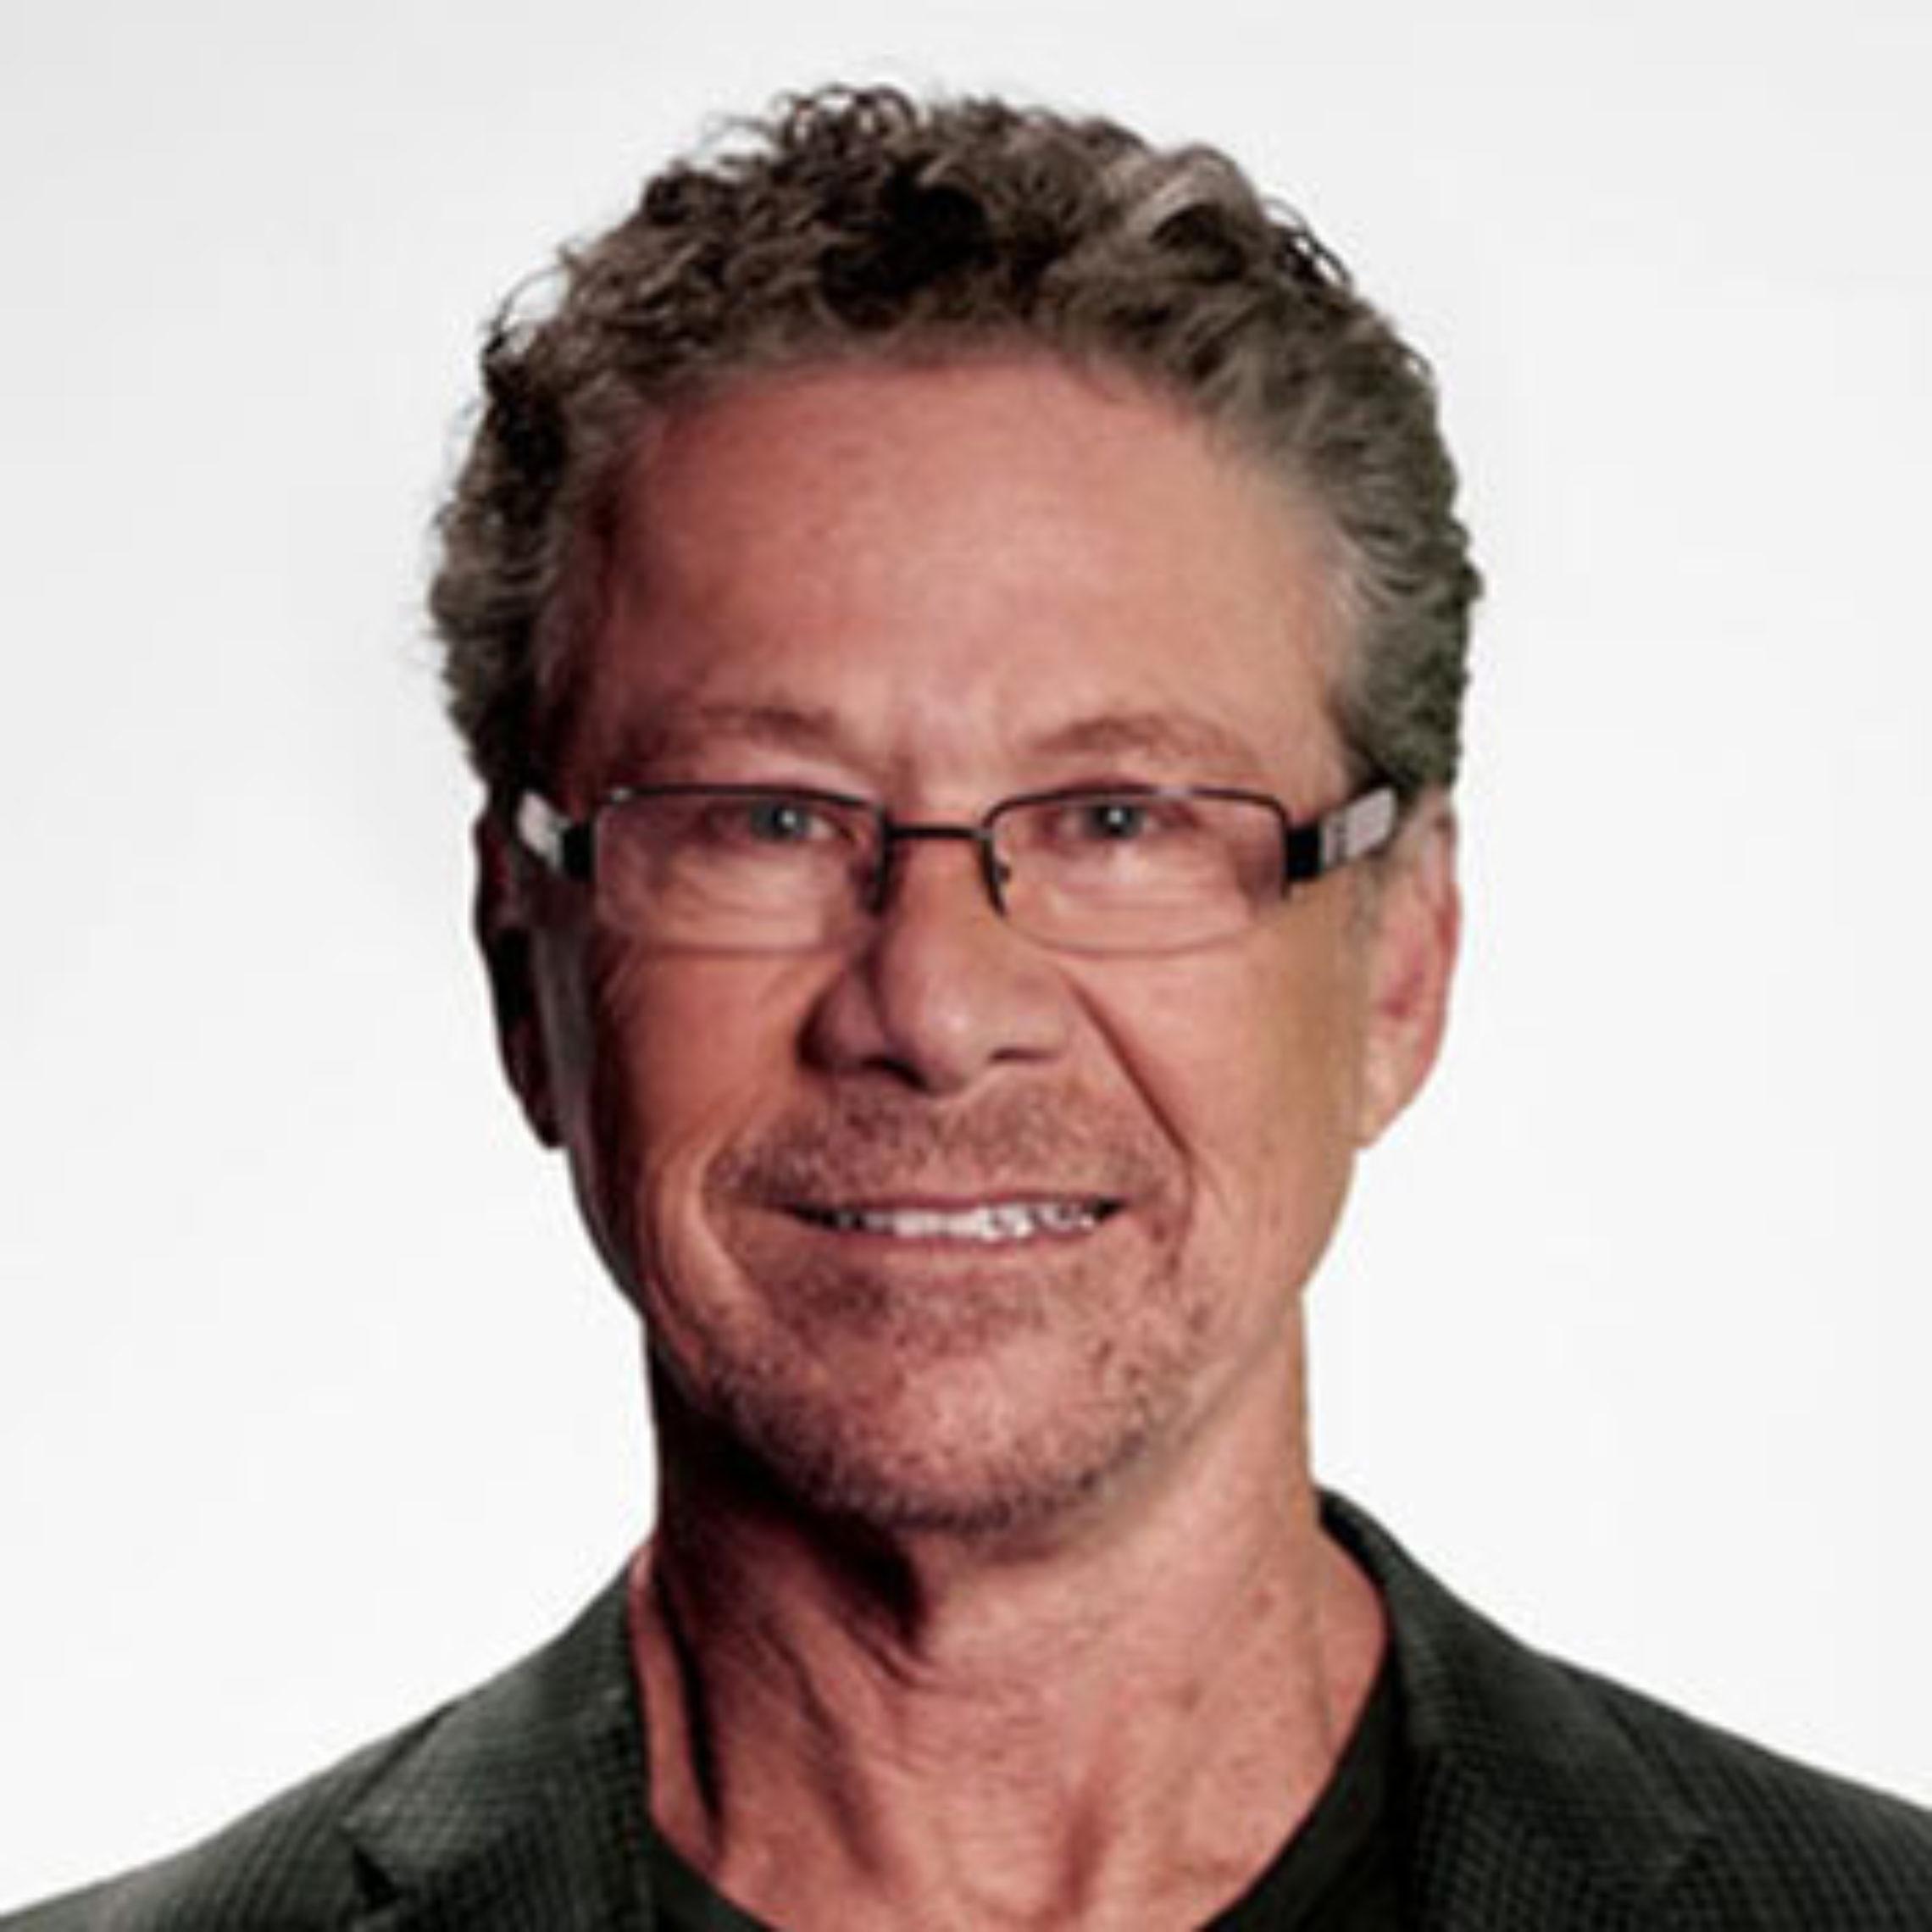 Profile Steven Edelman